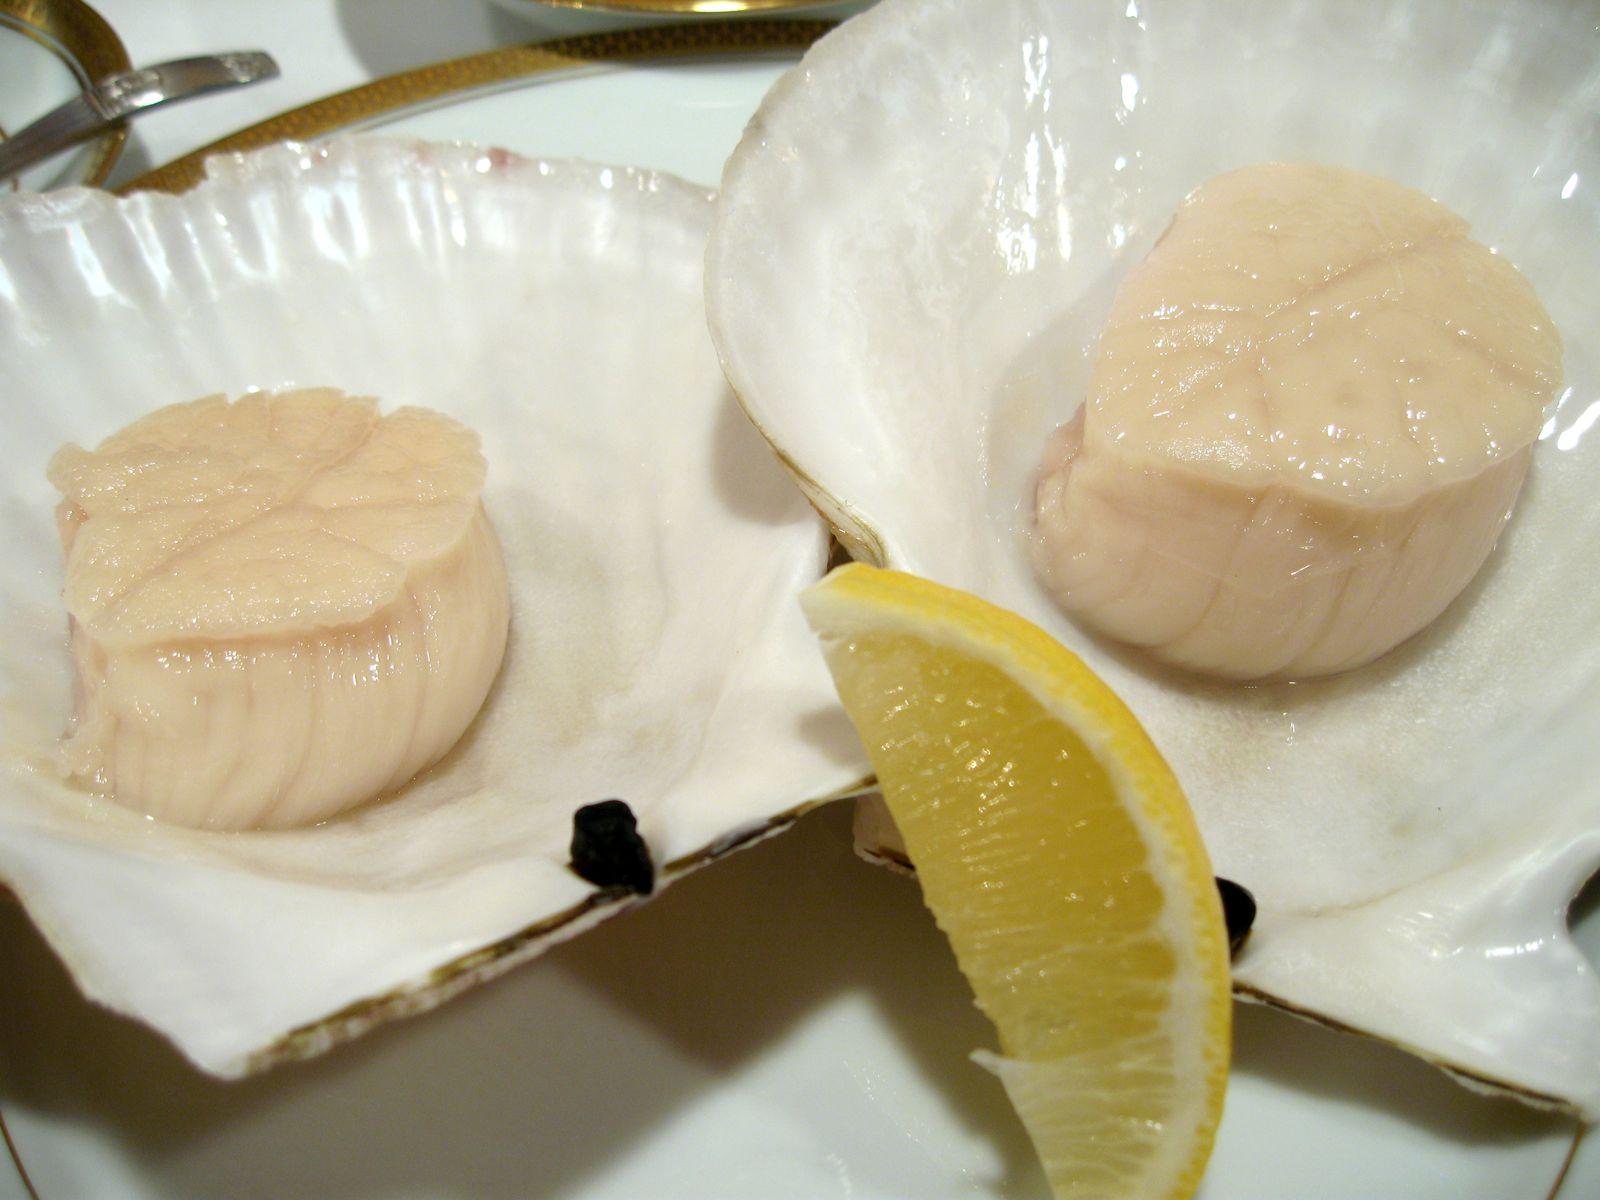 Scallops and Lemon